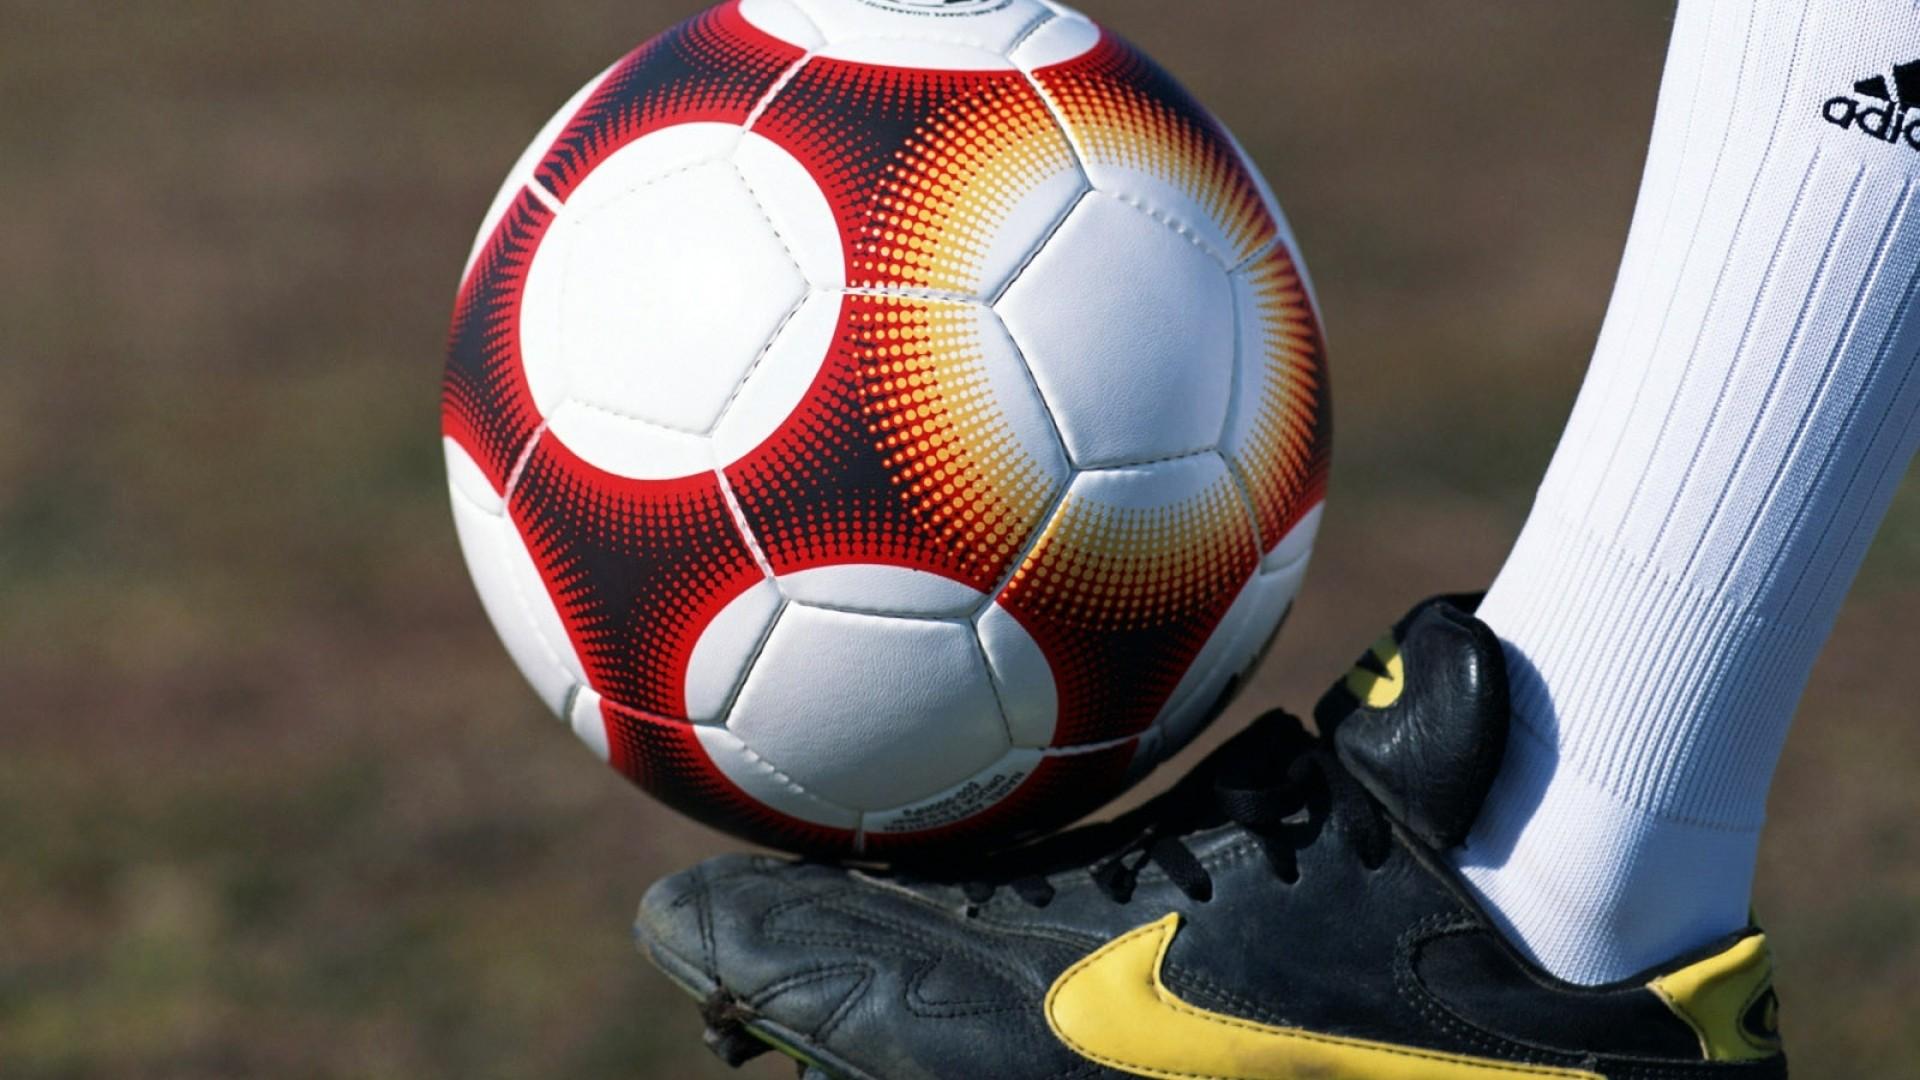 … Background Full HD 1080p. Wallpaper ball, foot, football,  football boots, field